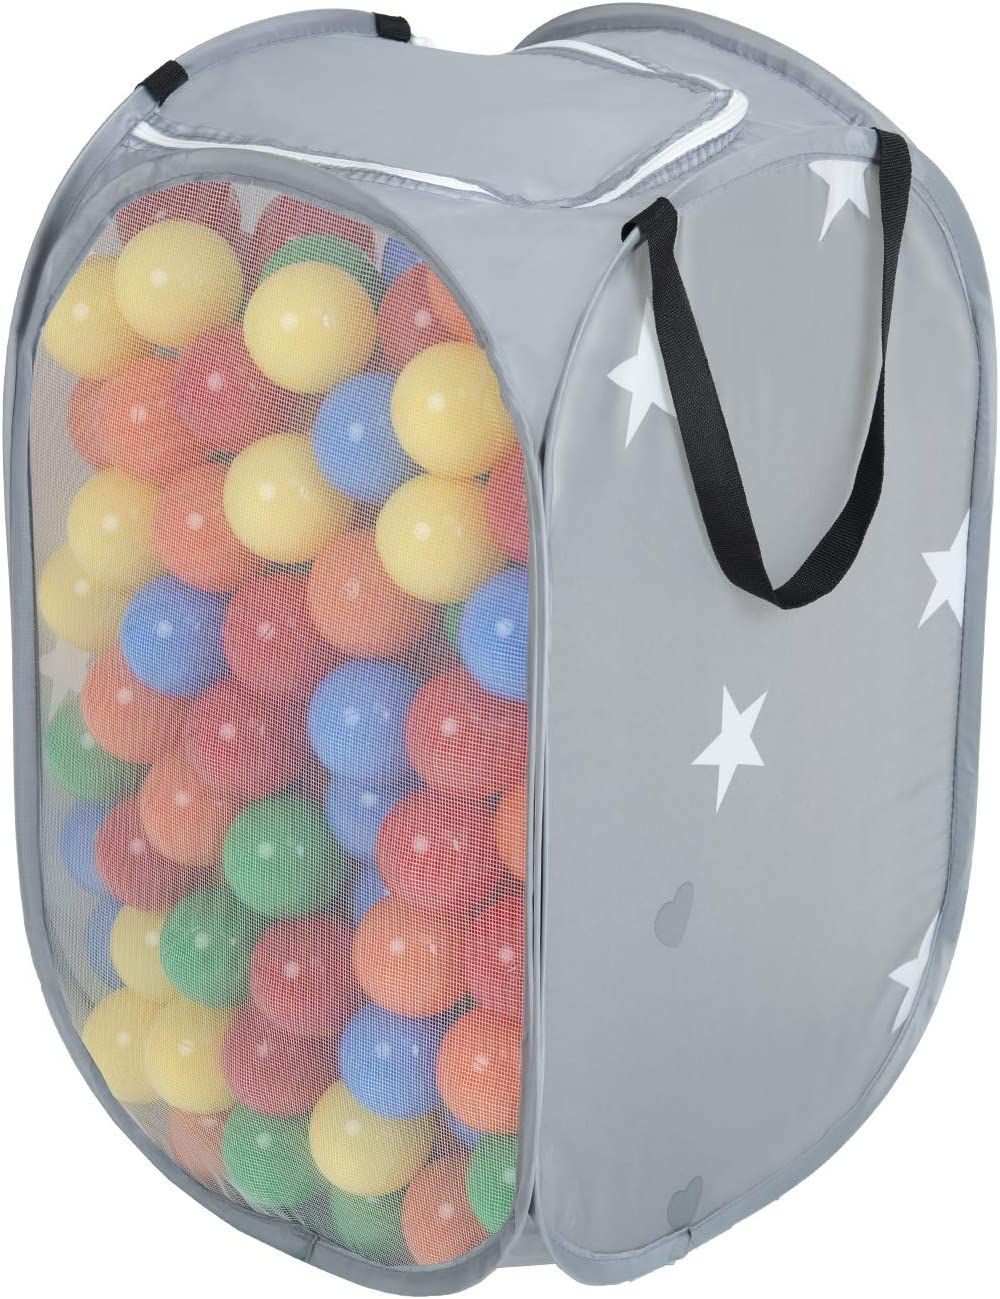 KiddyMoon Cesta De Malla Con 200 bolas (∅ 7cm) Coloridas Para Niños NZ-42-GREY, Gris:Amarillo/Verde/Azul/Rojo/Naranja